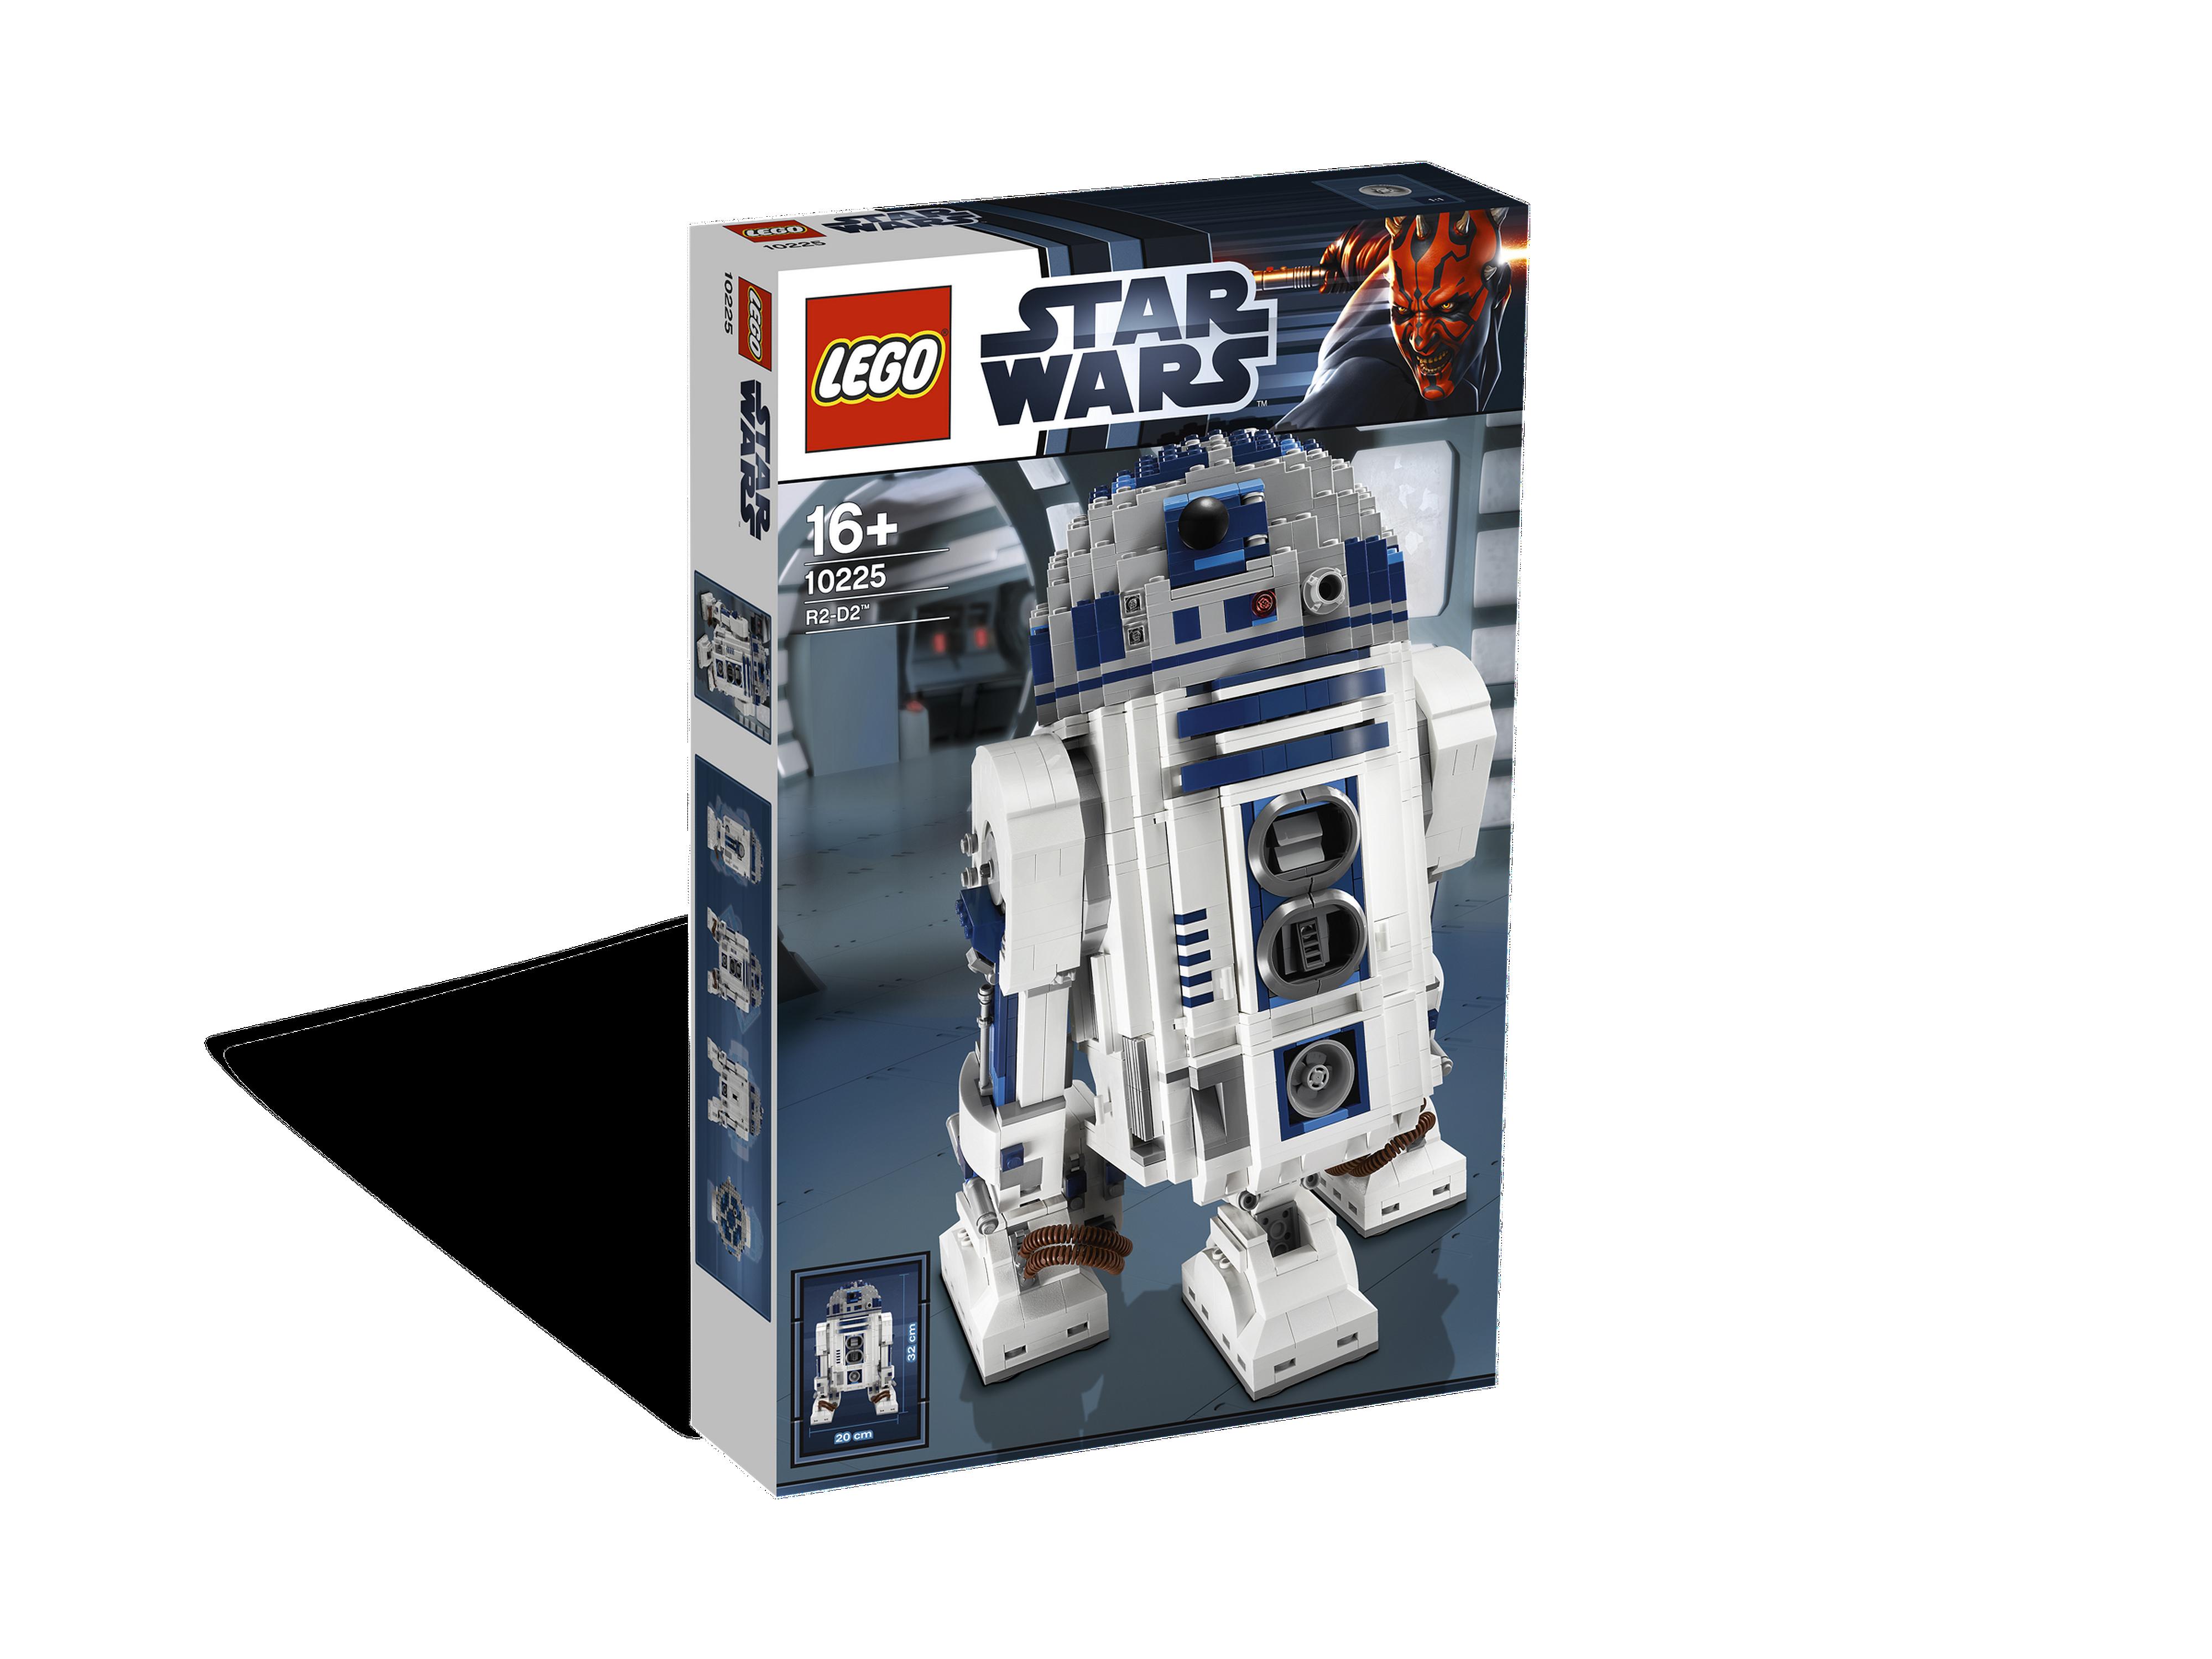 10225 r2 d2 brickipedia the lego wiki - Lego starwars r2d2 ...